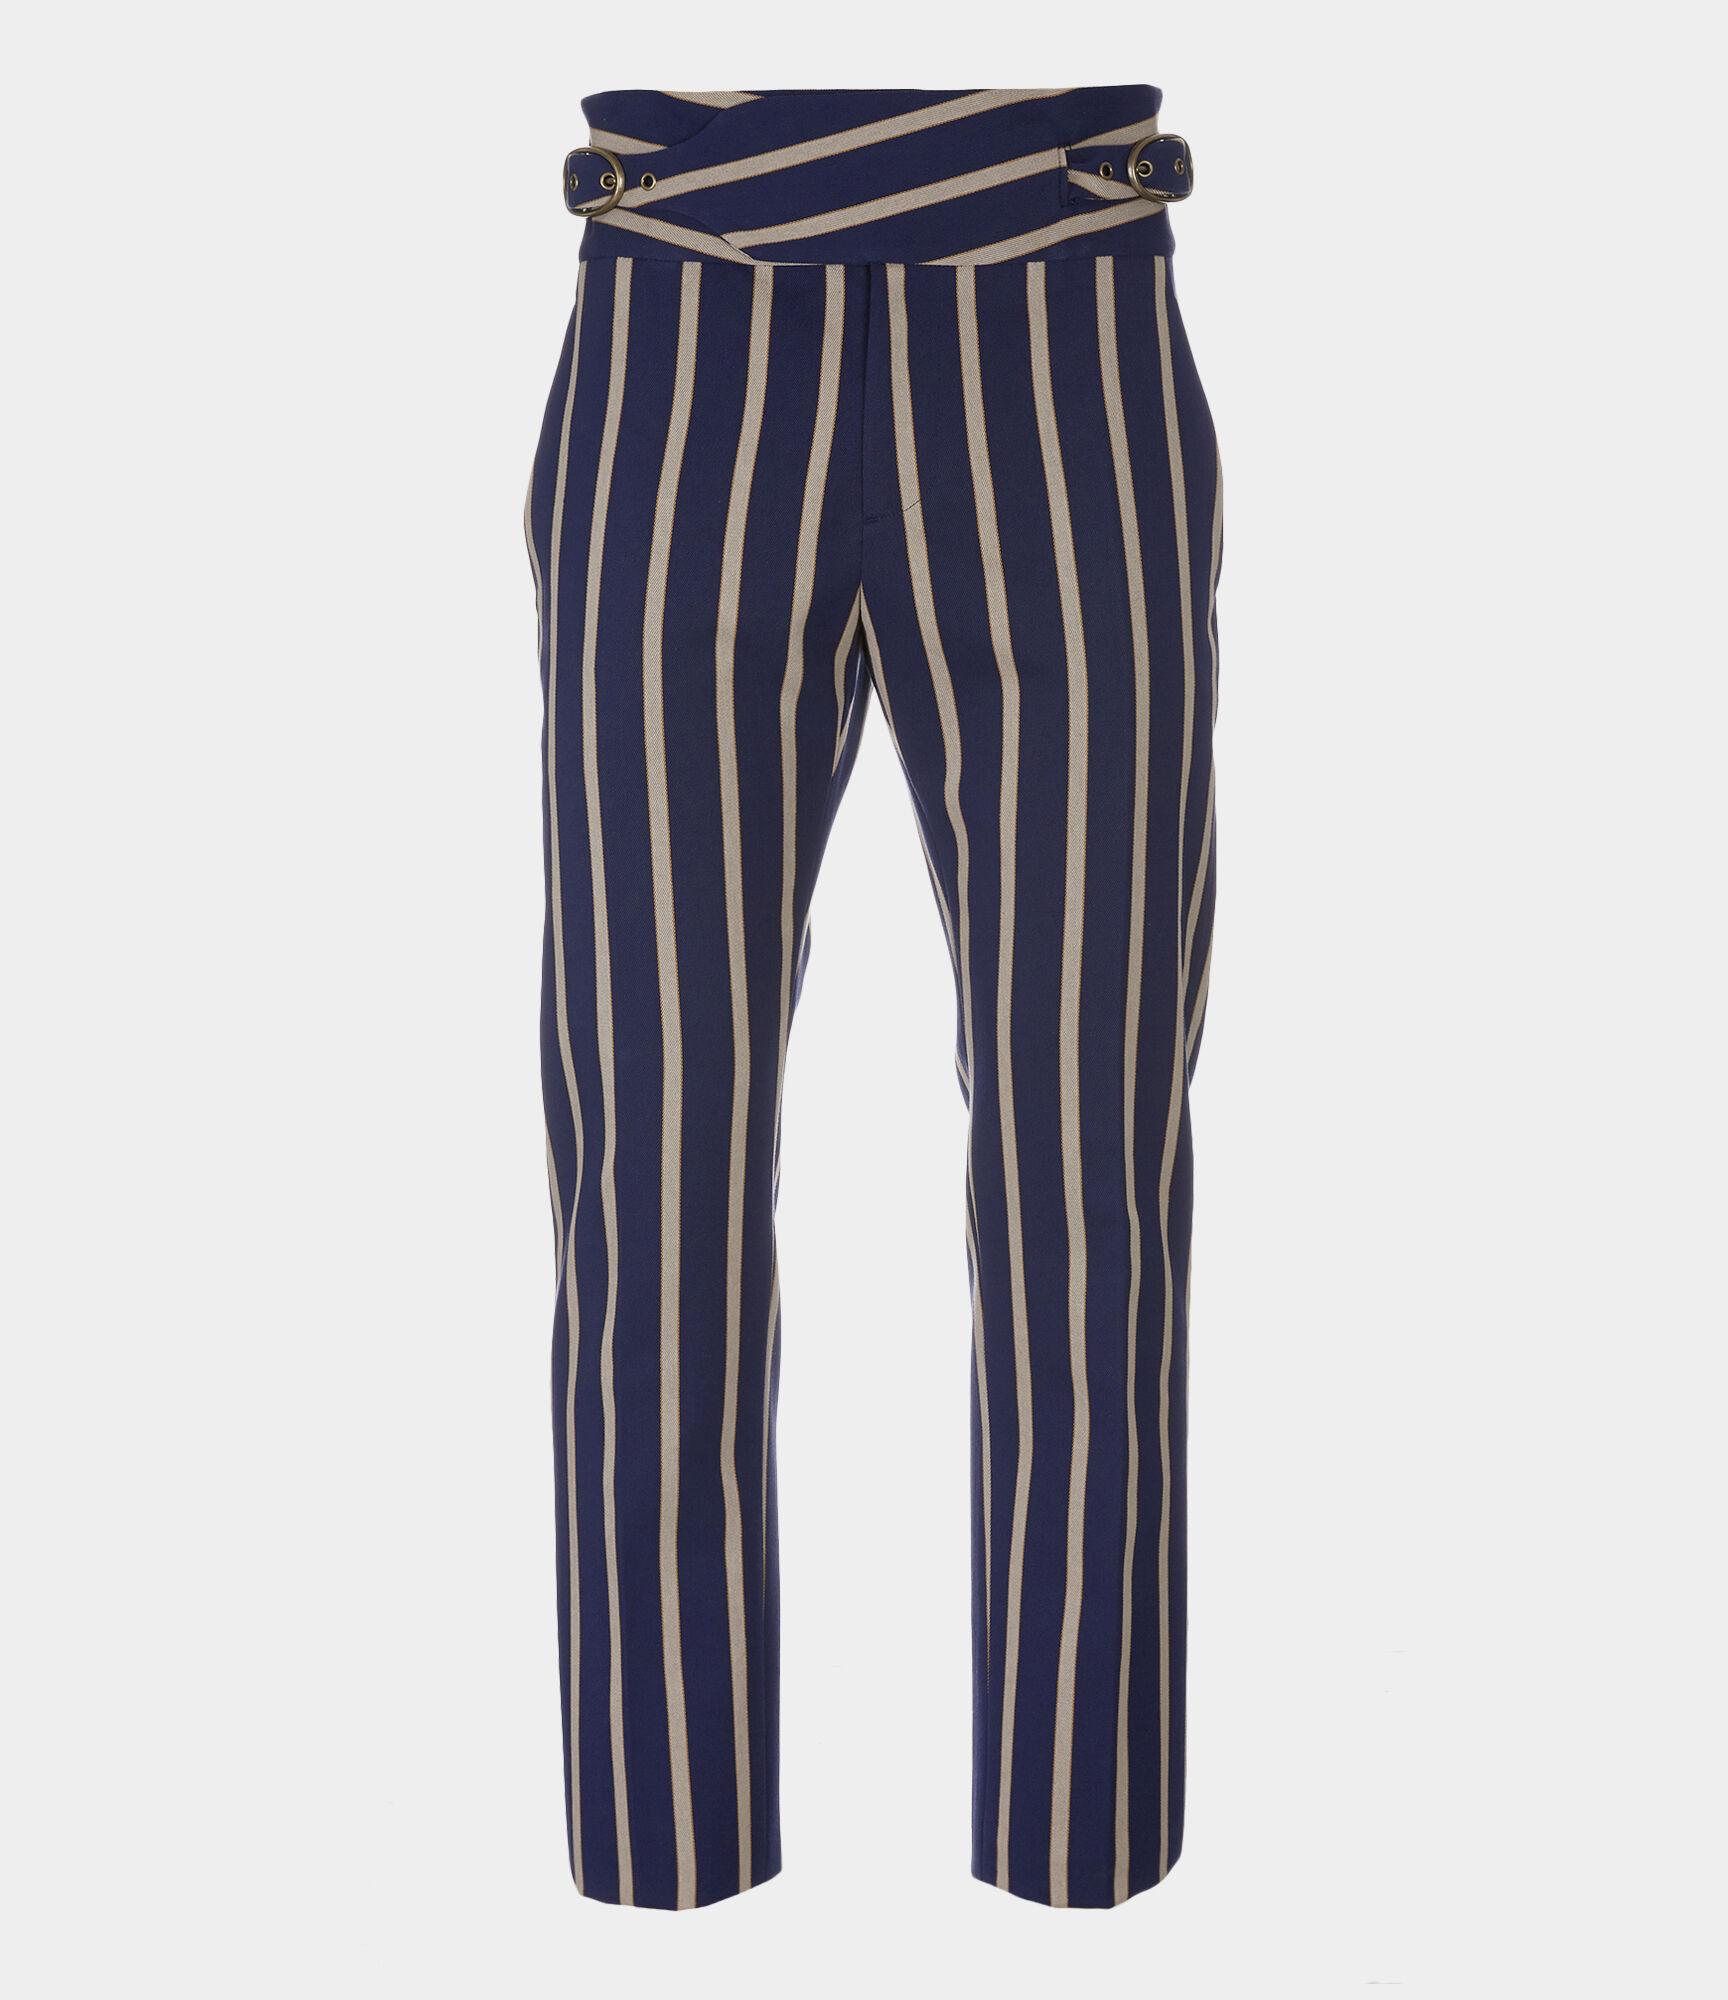 Peacock Trousers Blue/Khaki